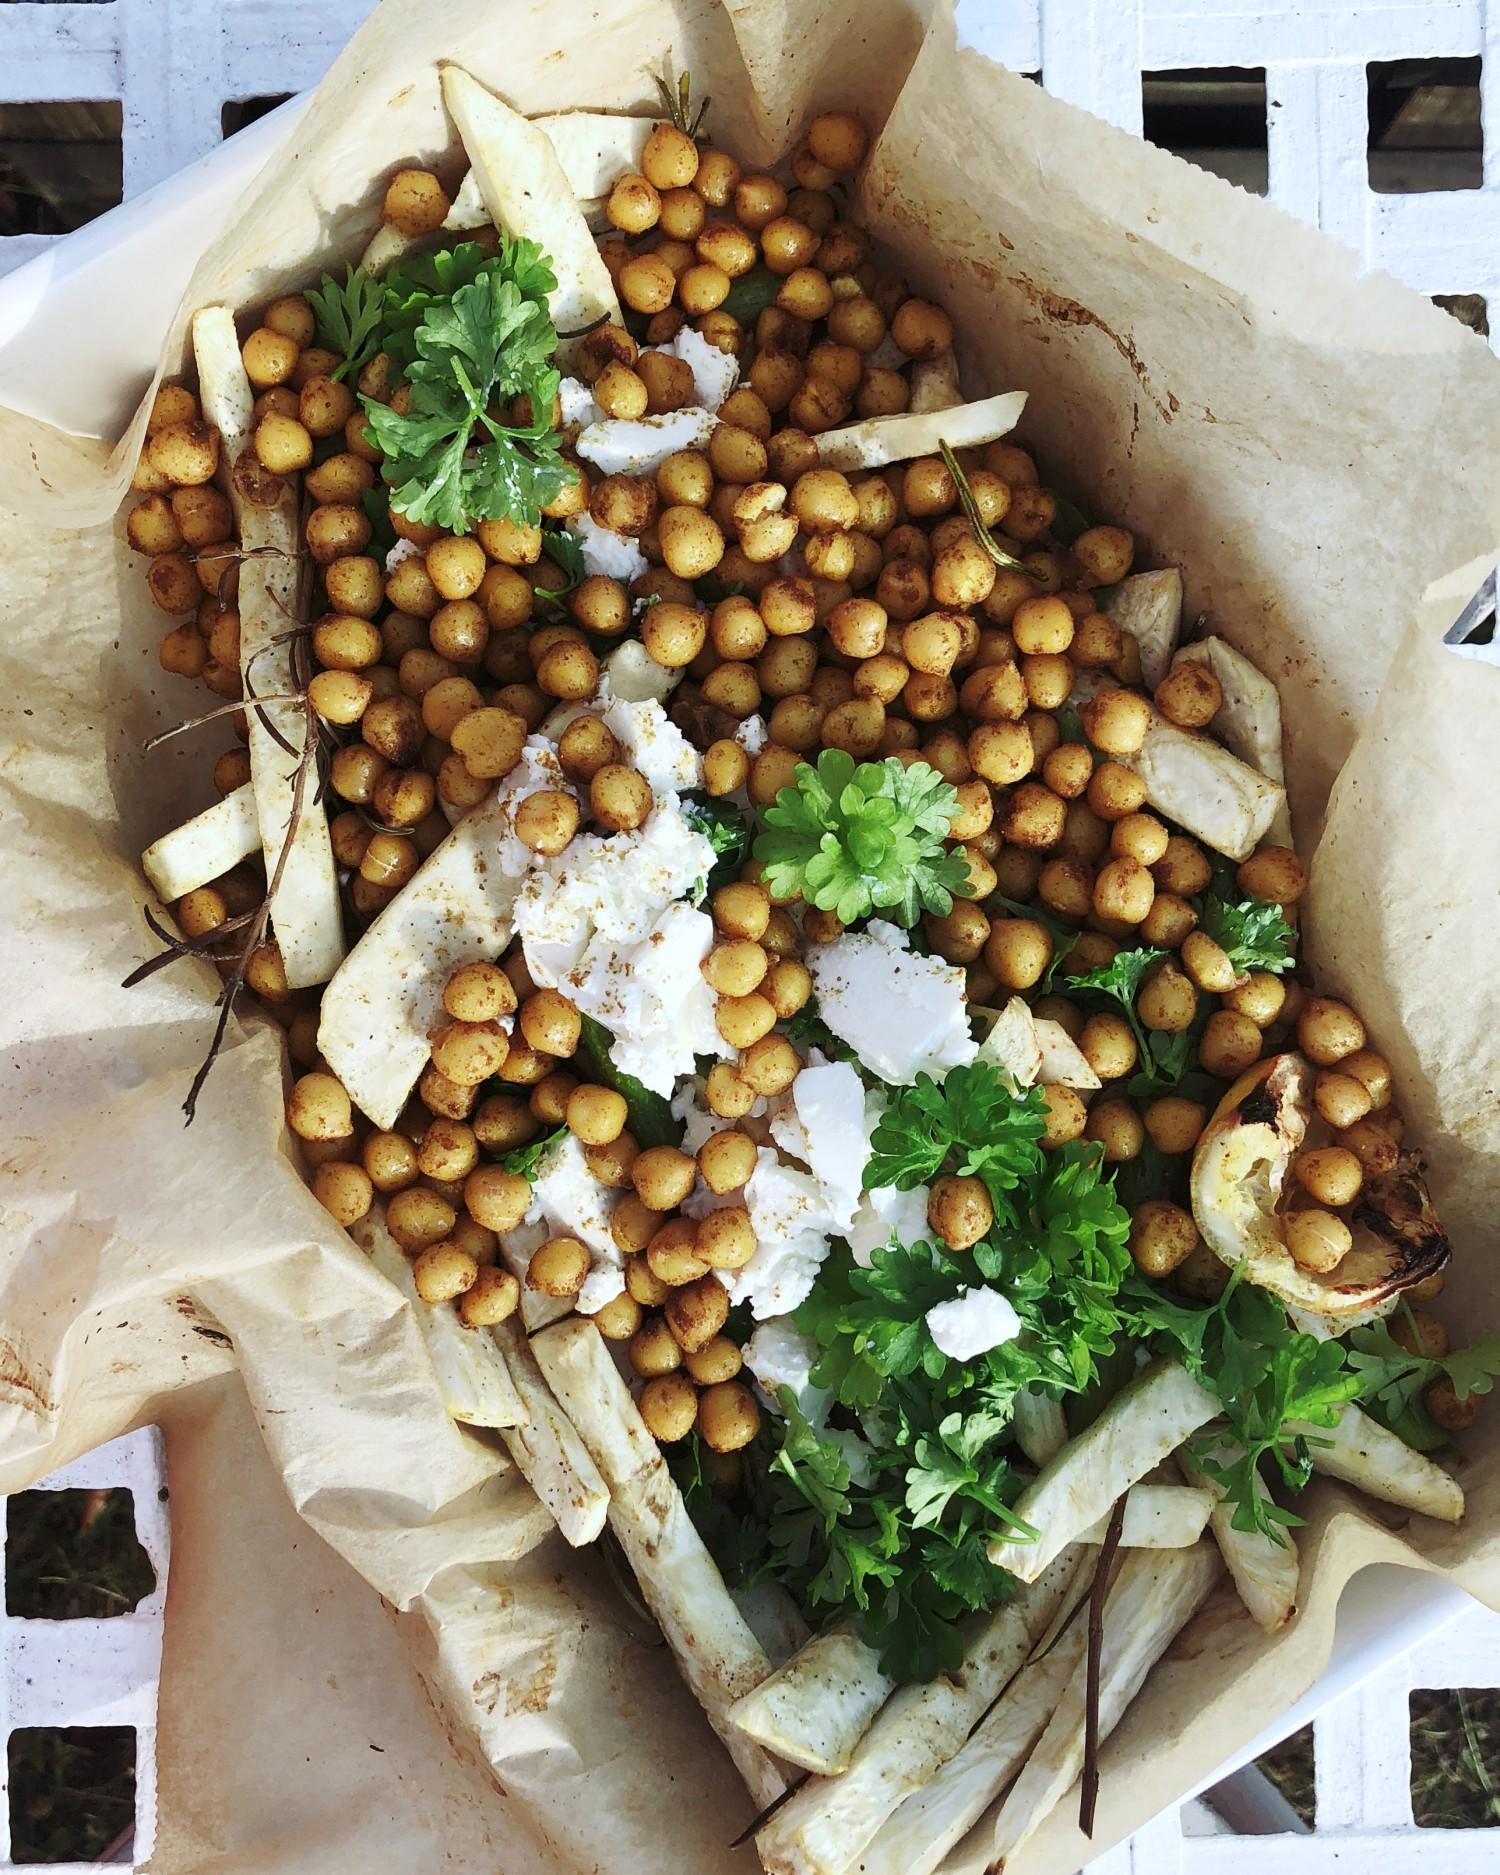 kikærter og knoldselleri salat